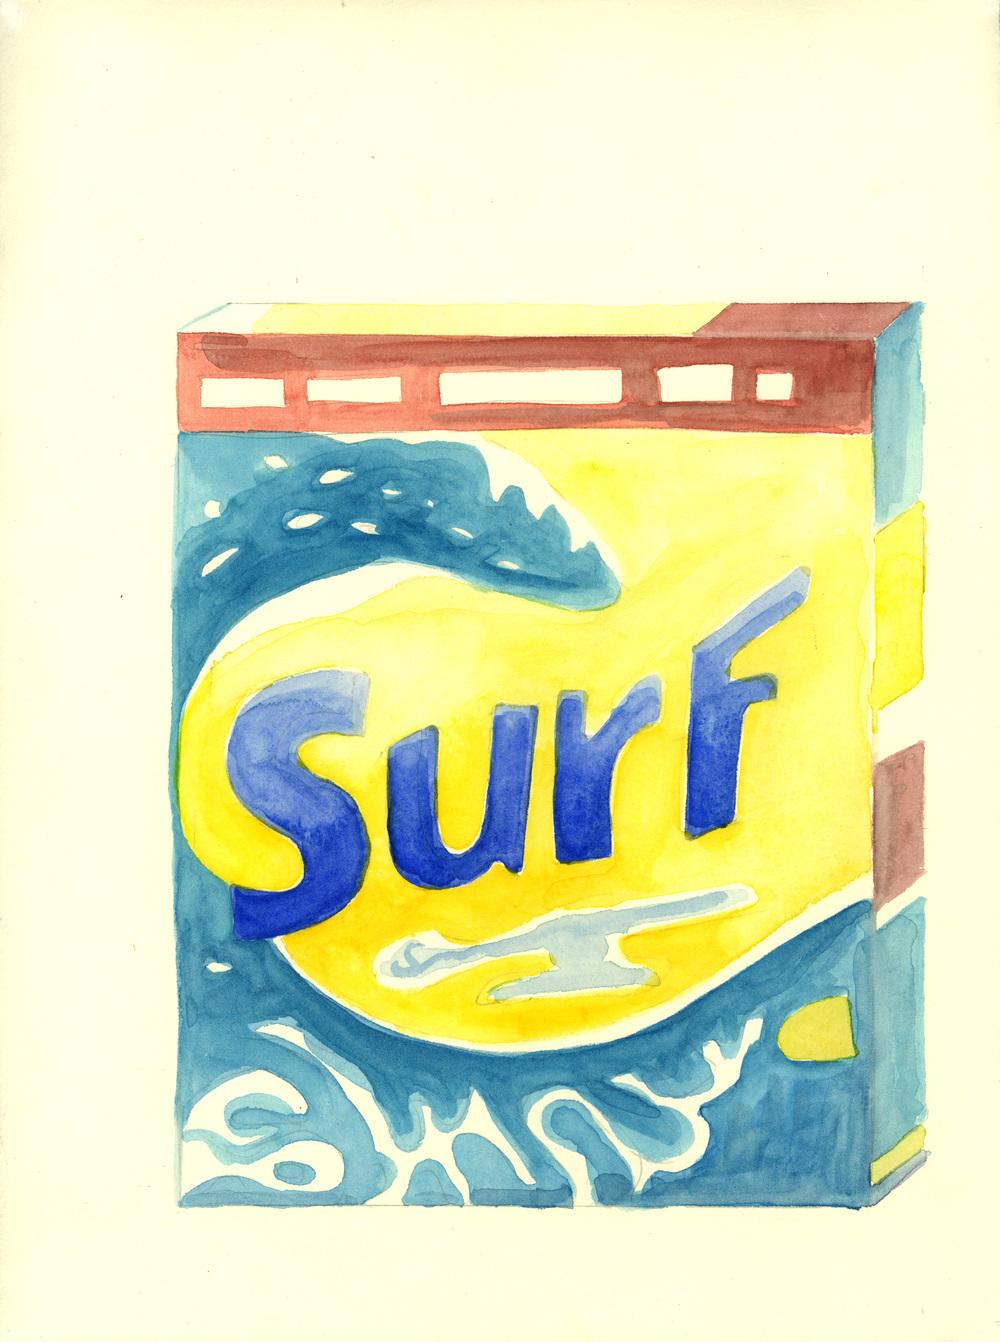 Surf, 2014